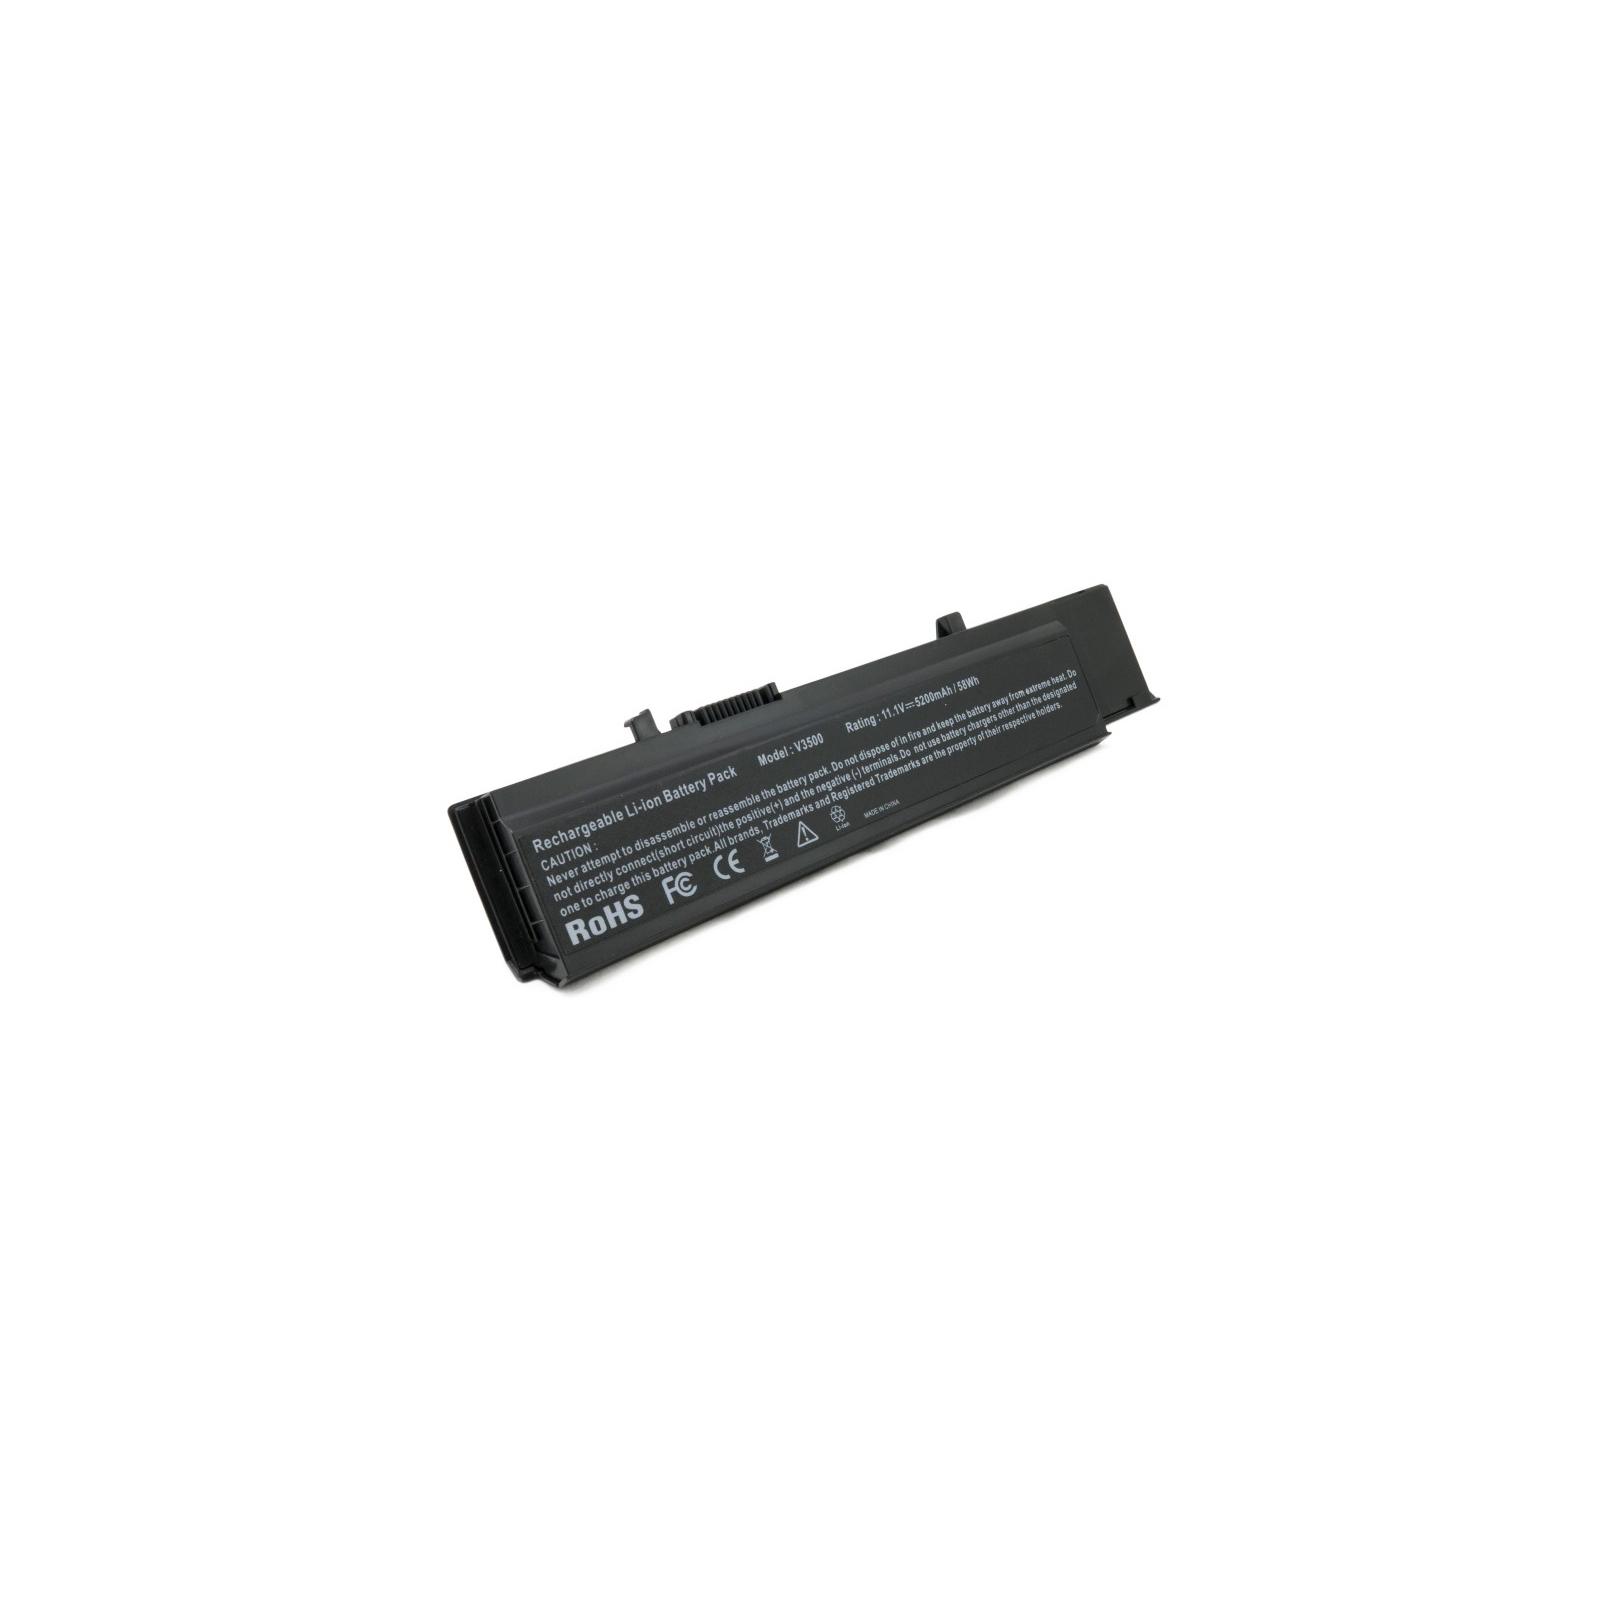 Аккумулятор для ноутбука Dell Vostro 3500, 5200 mAh Extradigital (BND3935)